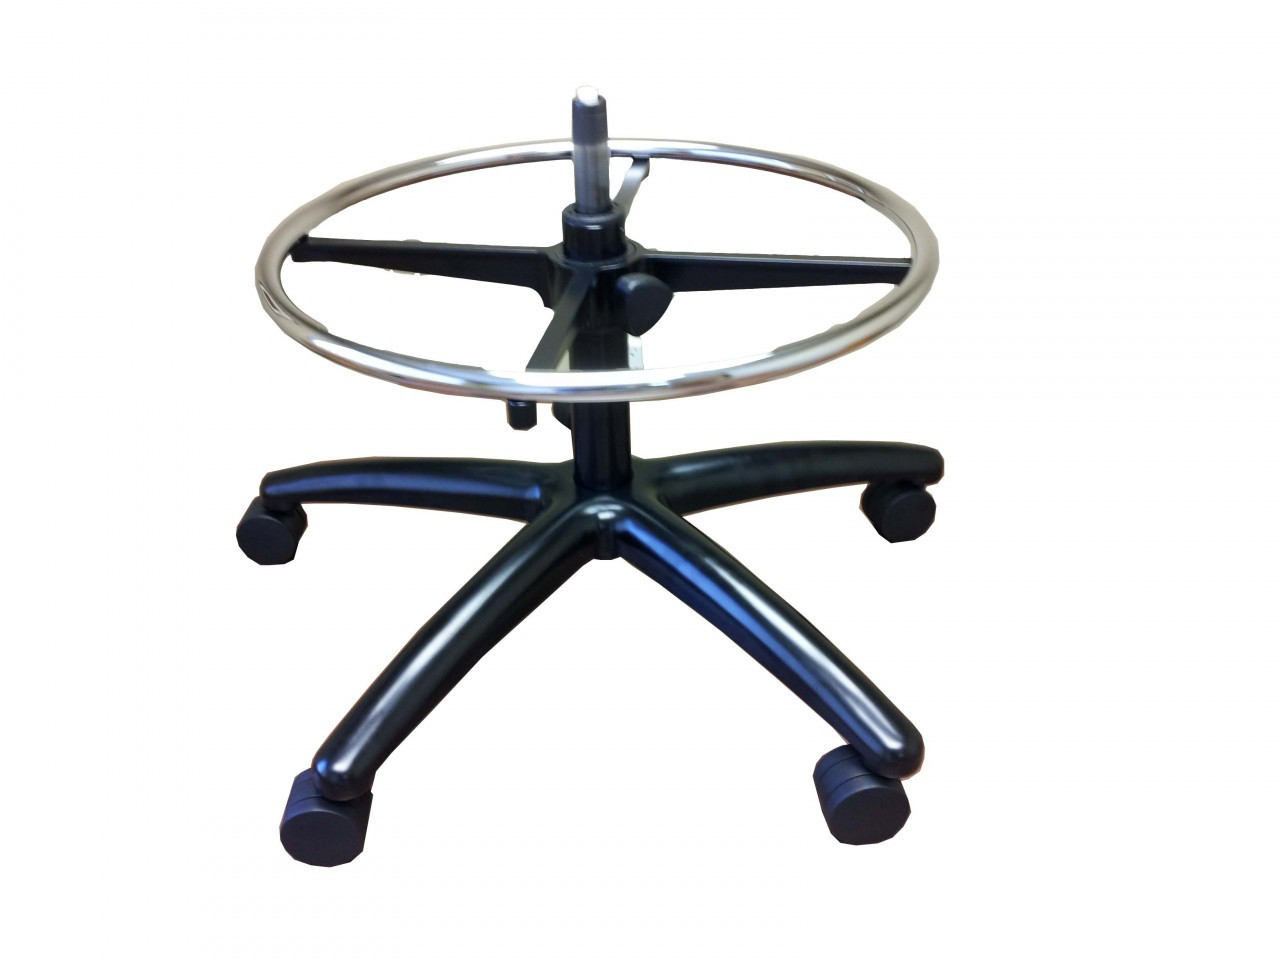 Conversion Chair Base Kit for Aeron Chair to Aeron Stool